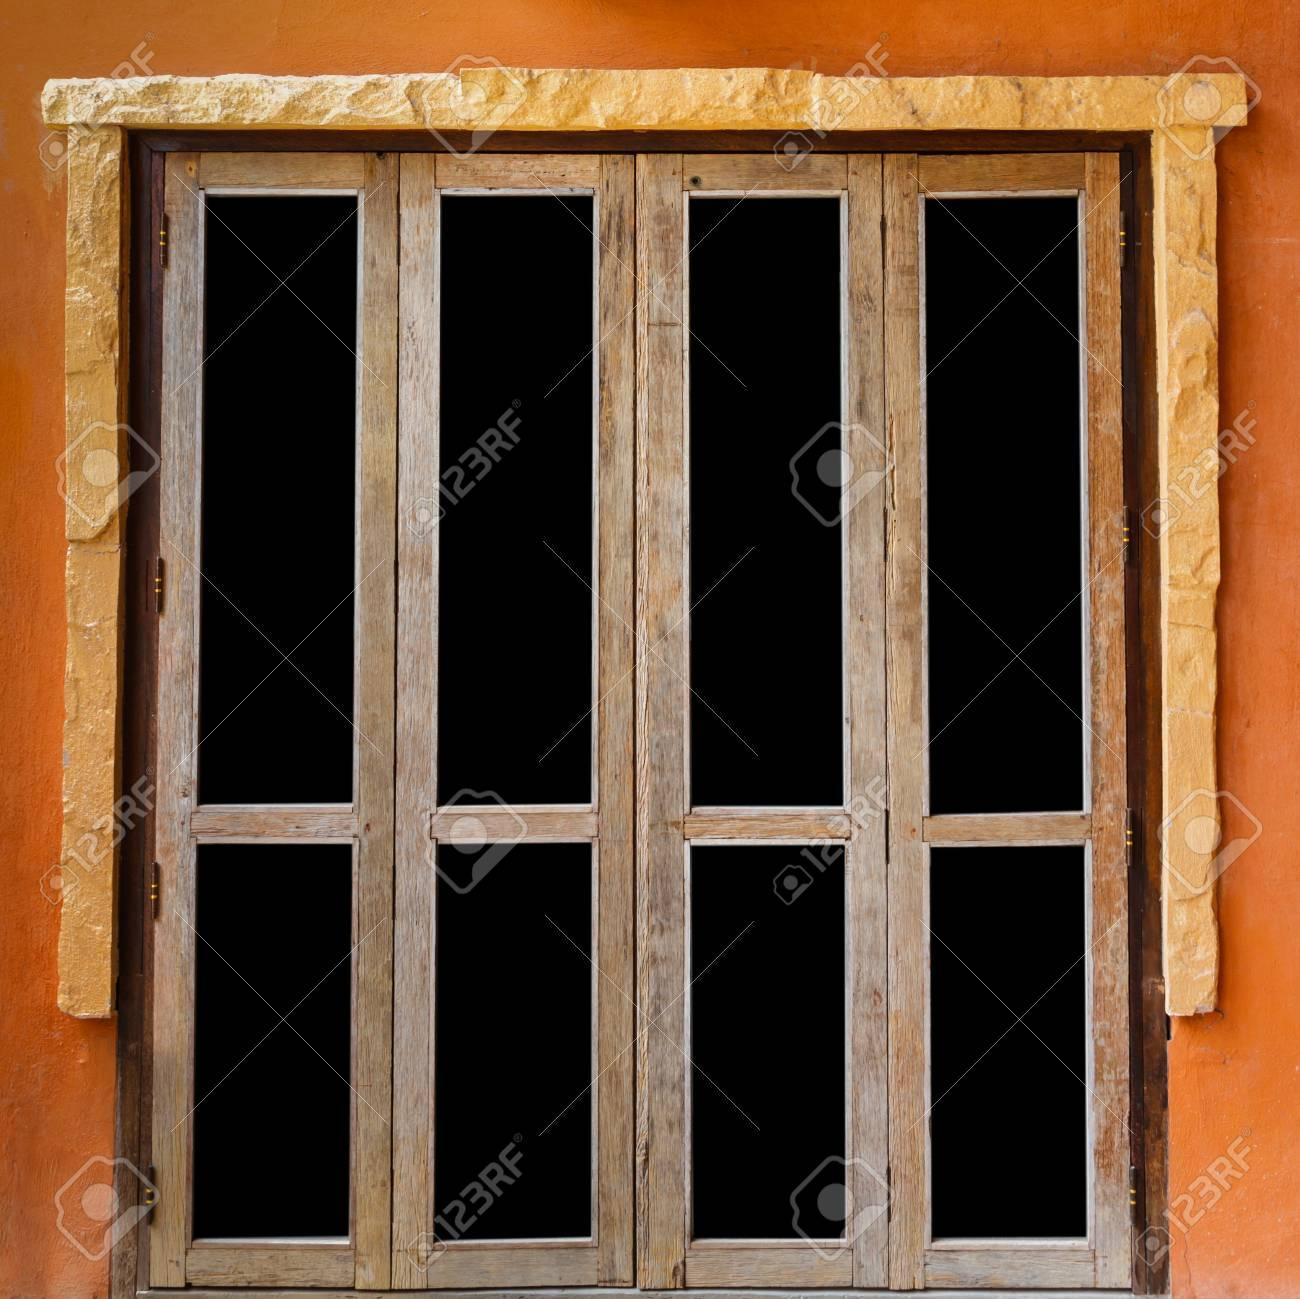 The door retro design. Stock Photo - 22116210